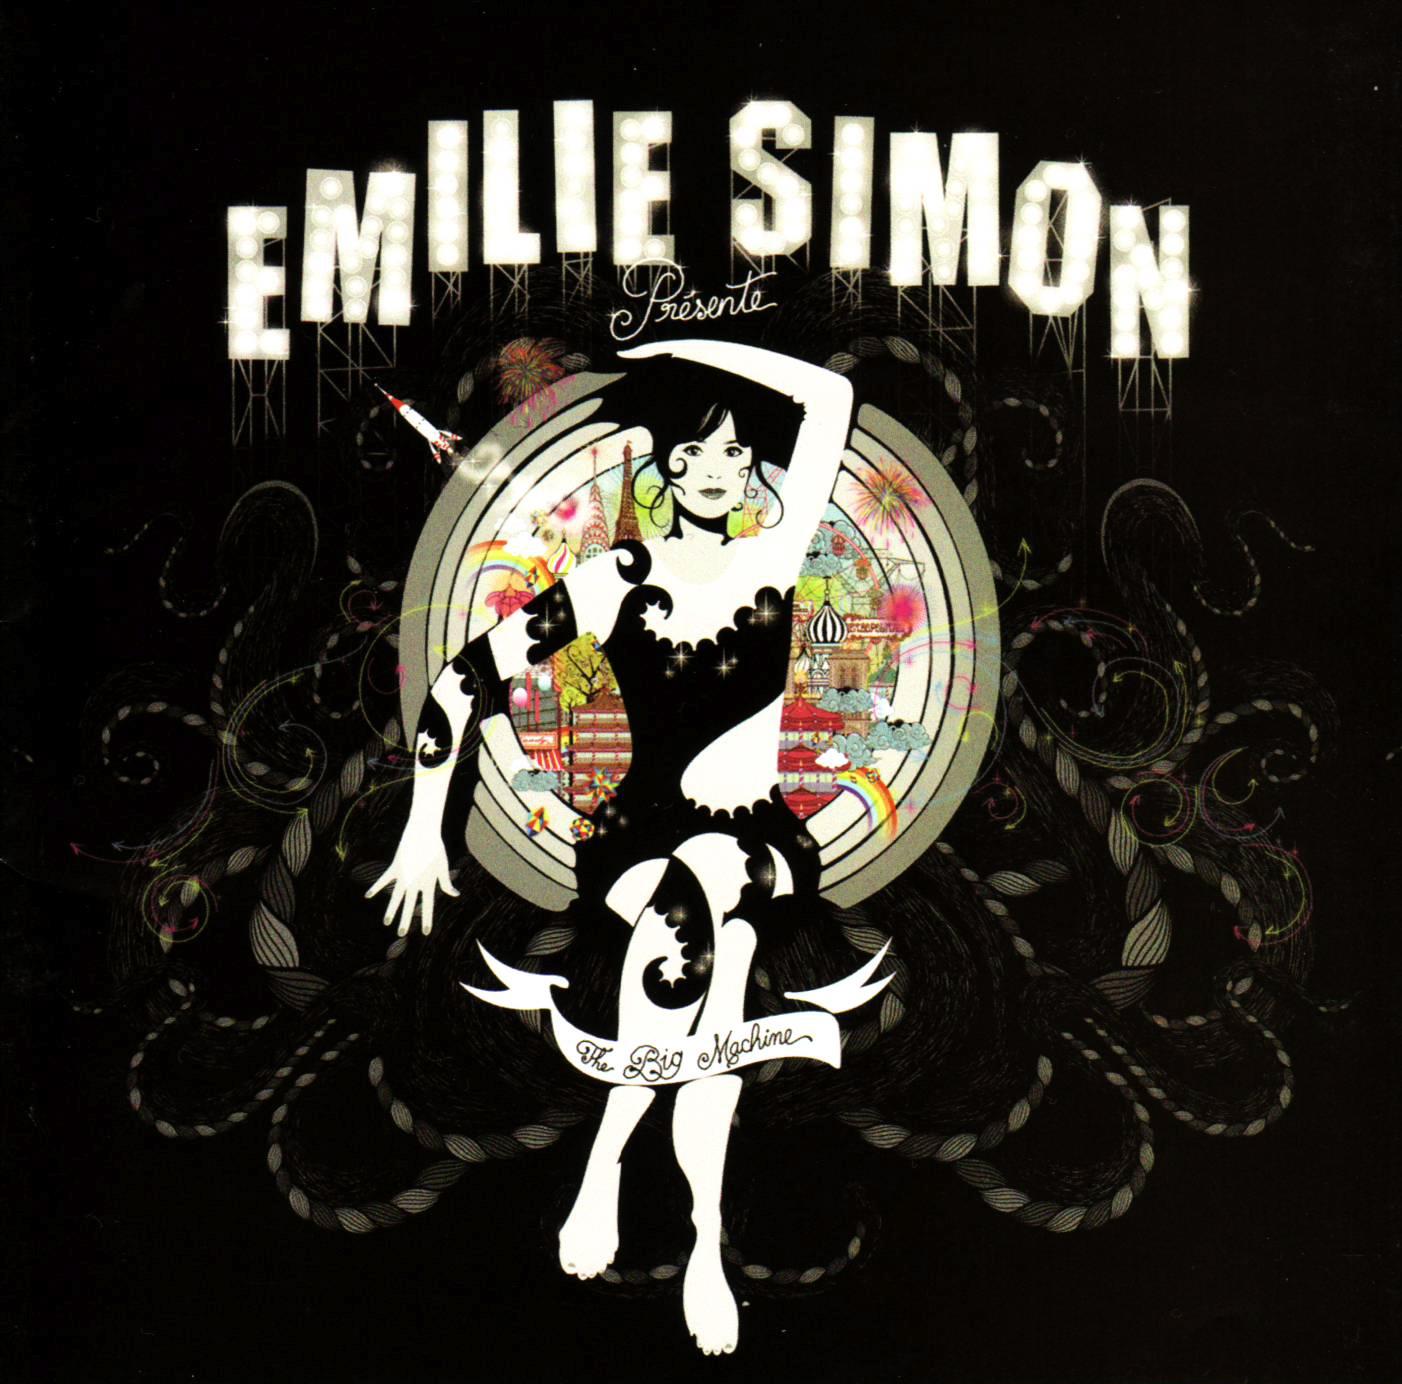 Emilie Simon big machine